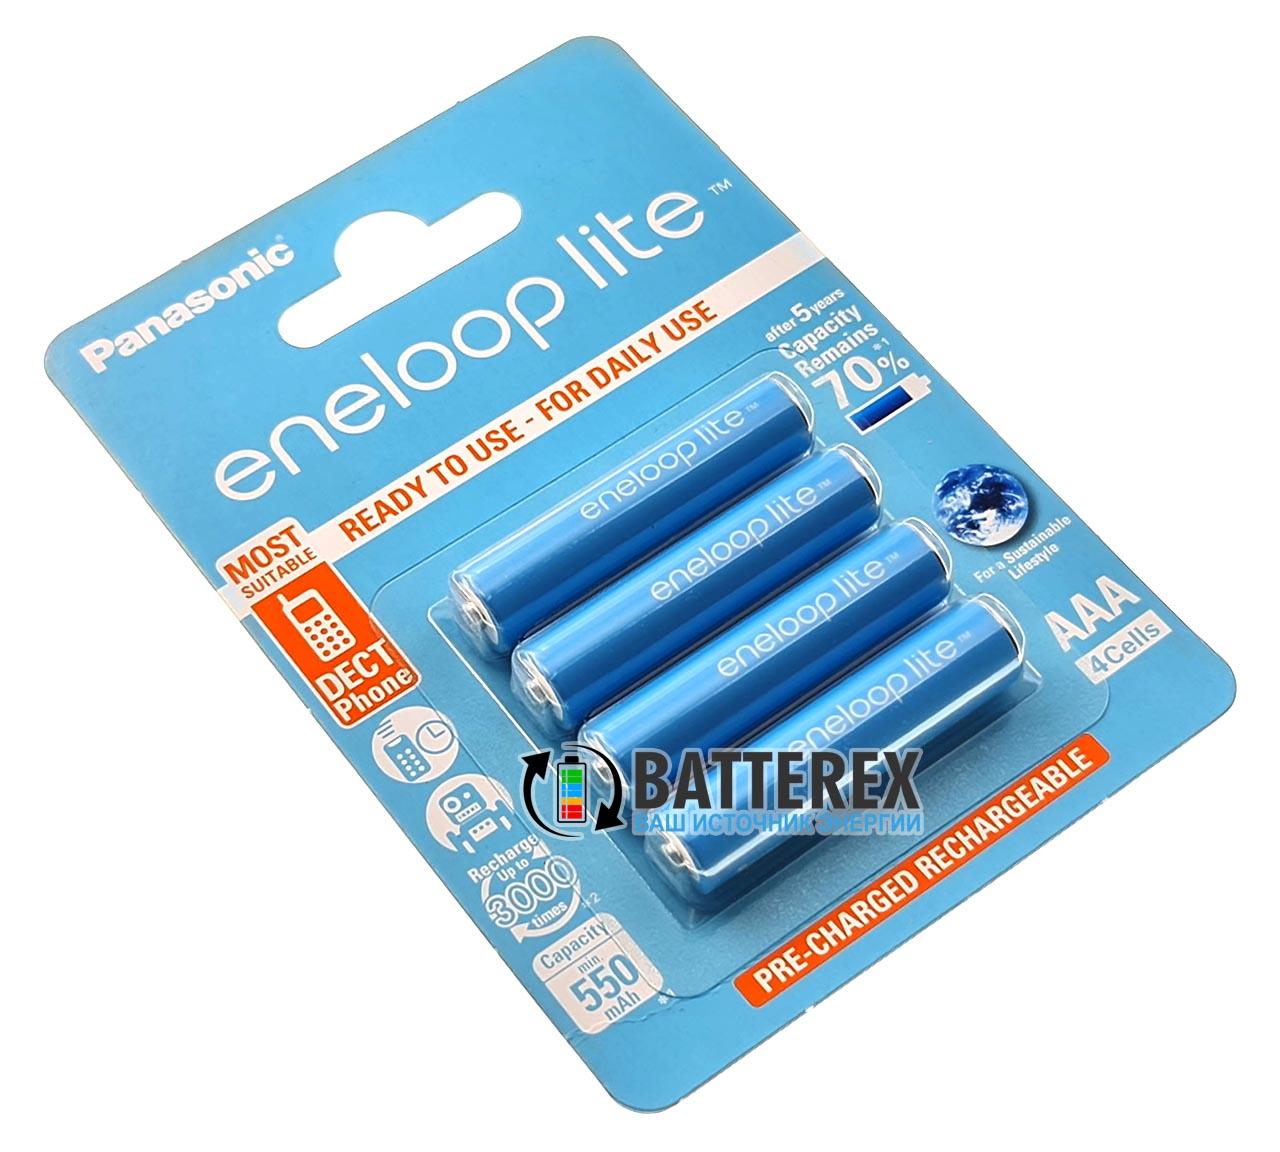 Аккумуляторы AAA Panasonic Eneloop Lite 600 mah BK-4LCCE/4BE